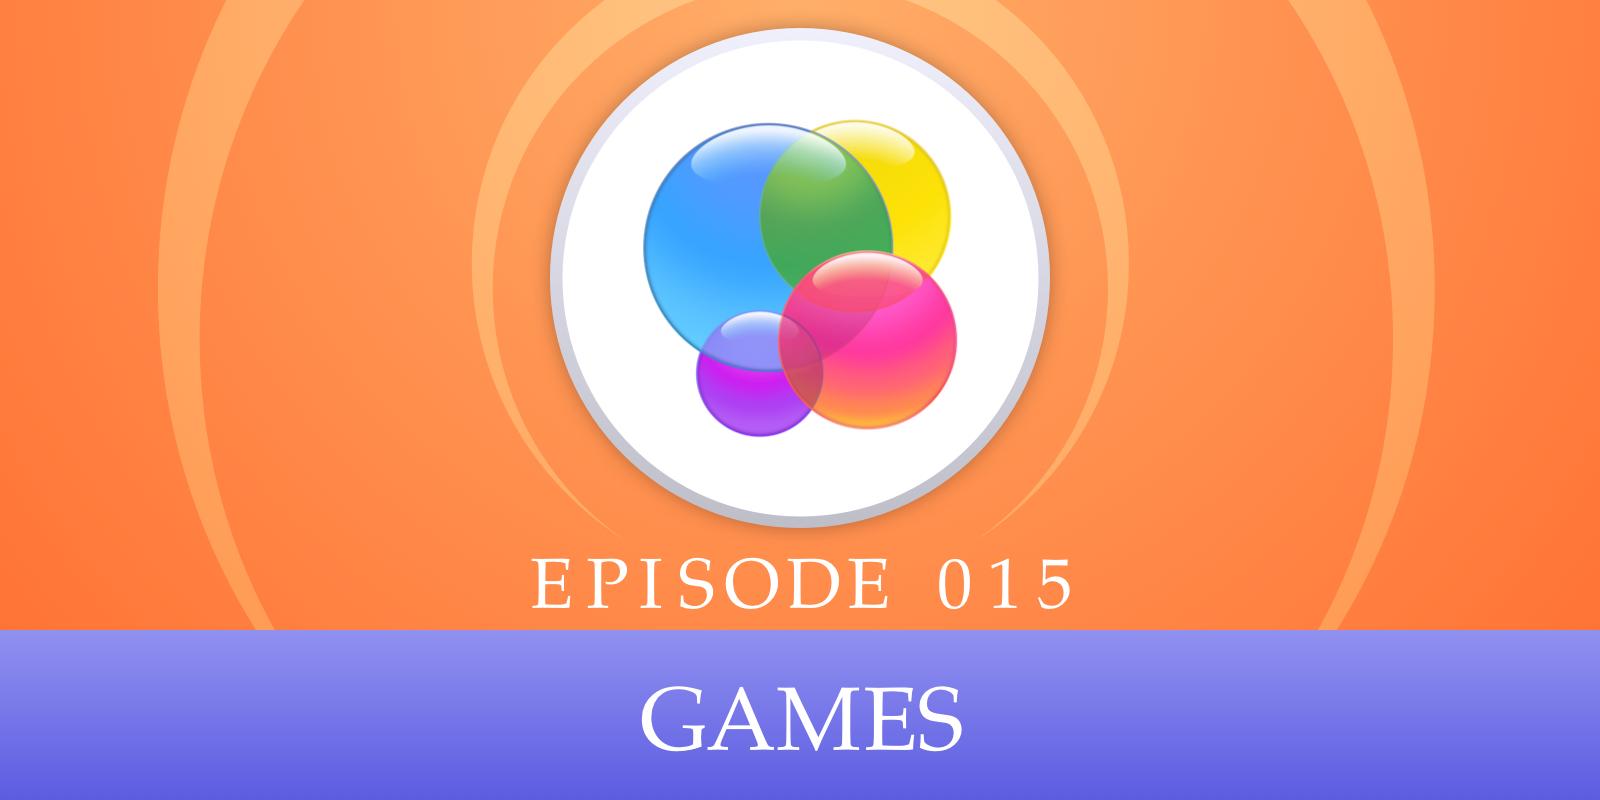 Episode 015: Games